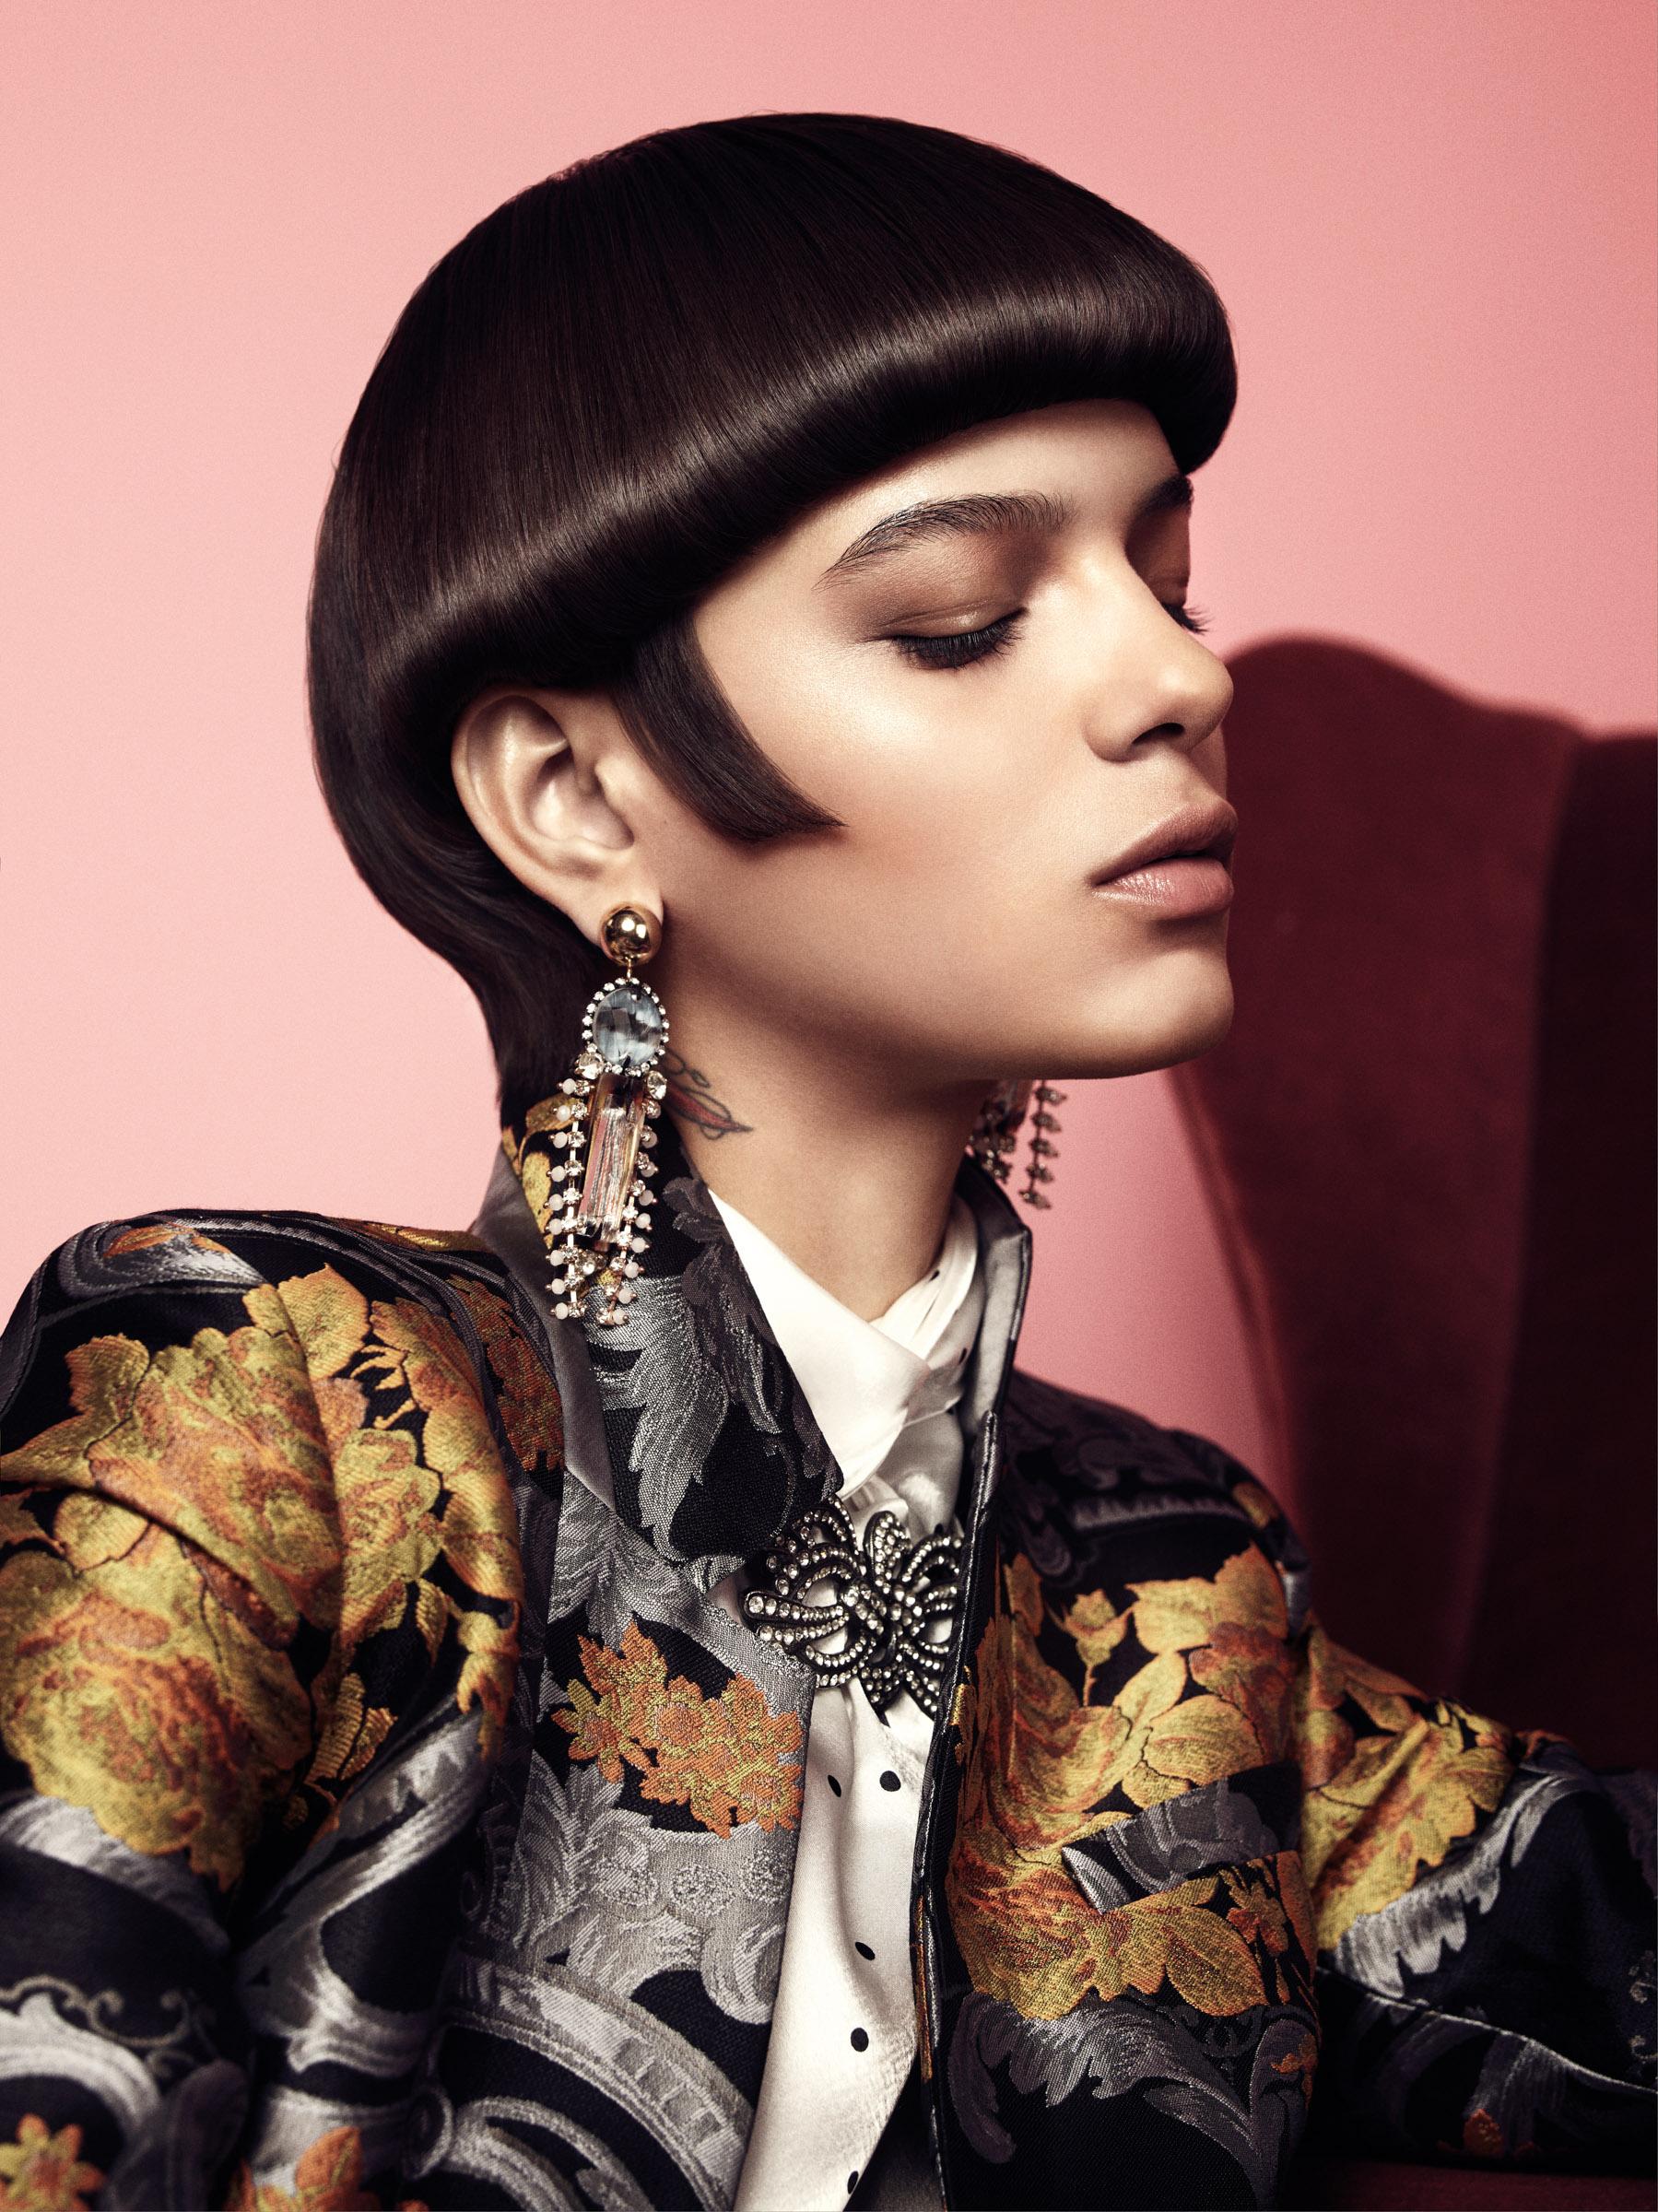 Jack-Eames-Toni-Guy-Hair-Beauty-Photography-Campaign-Pink-Fashion-04.jpg